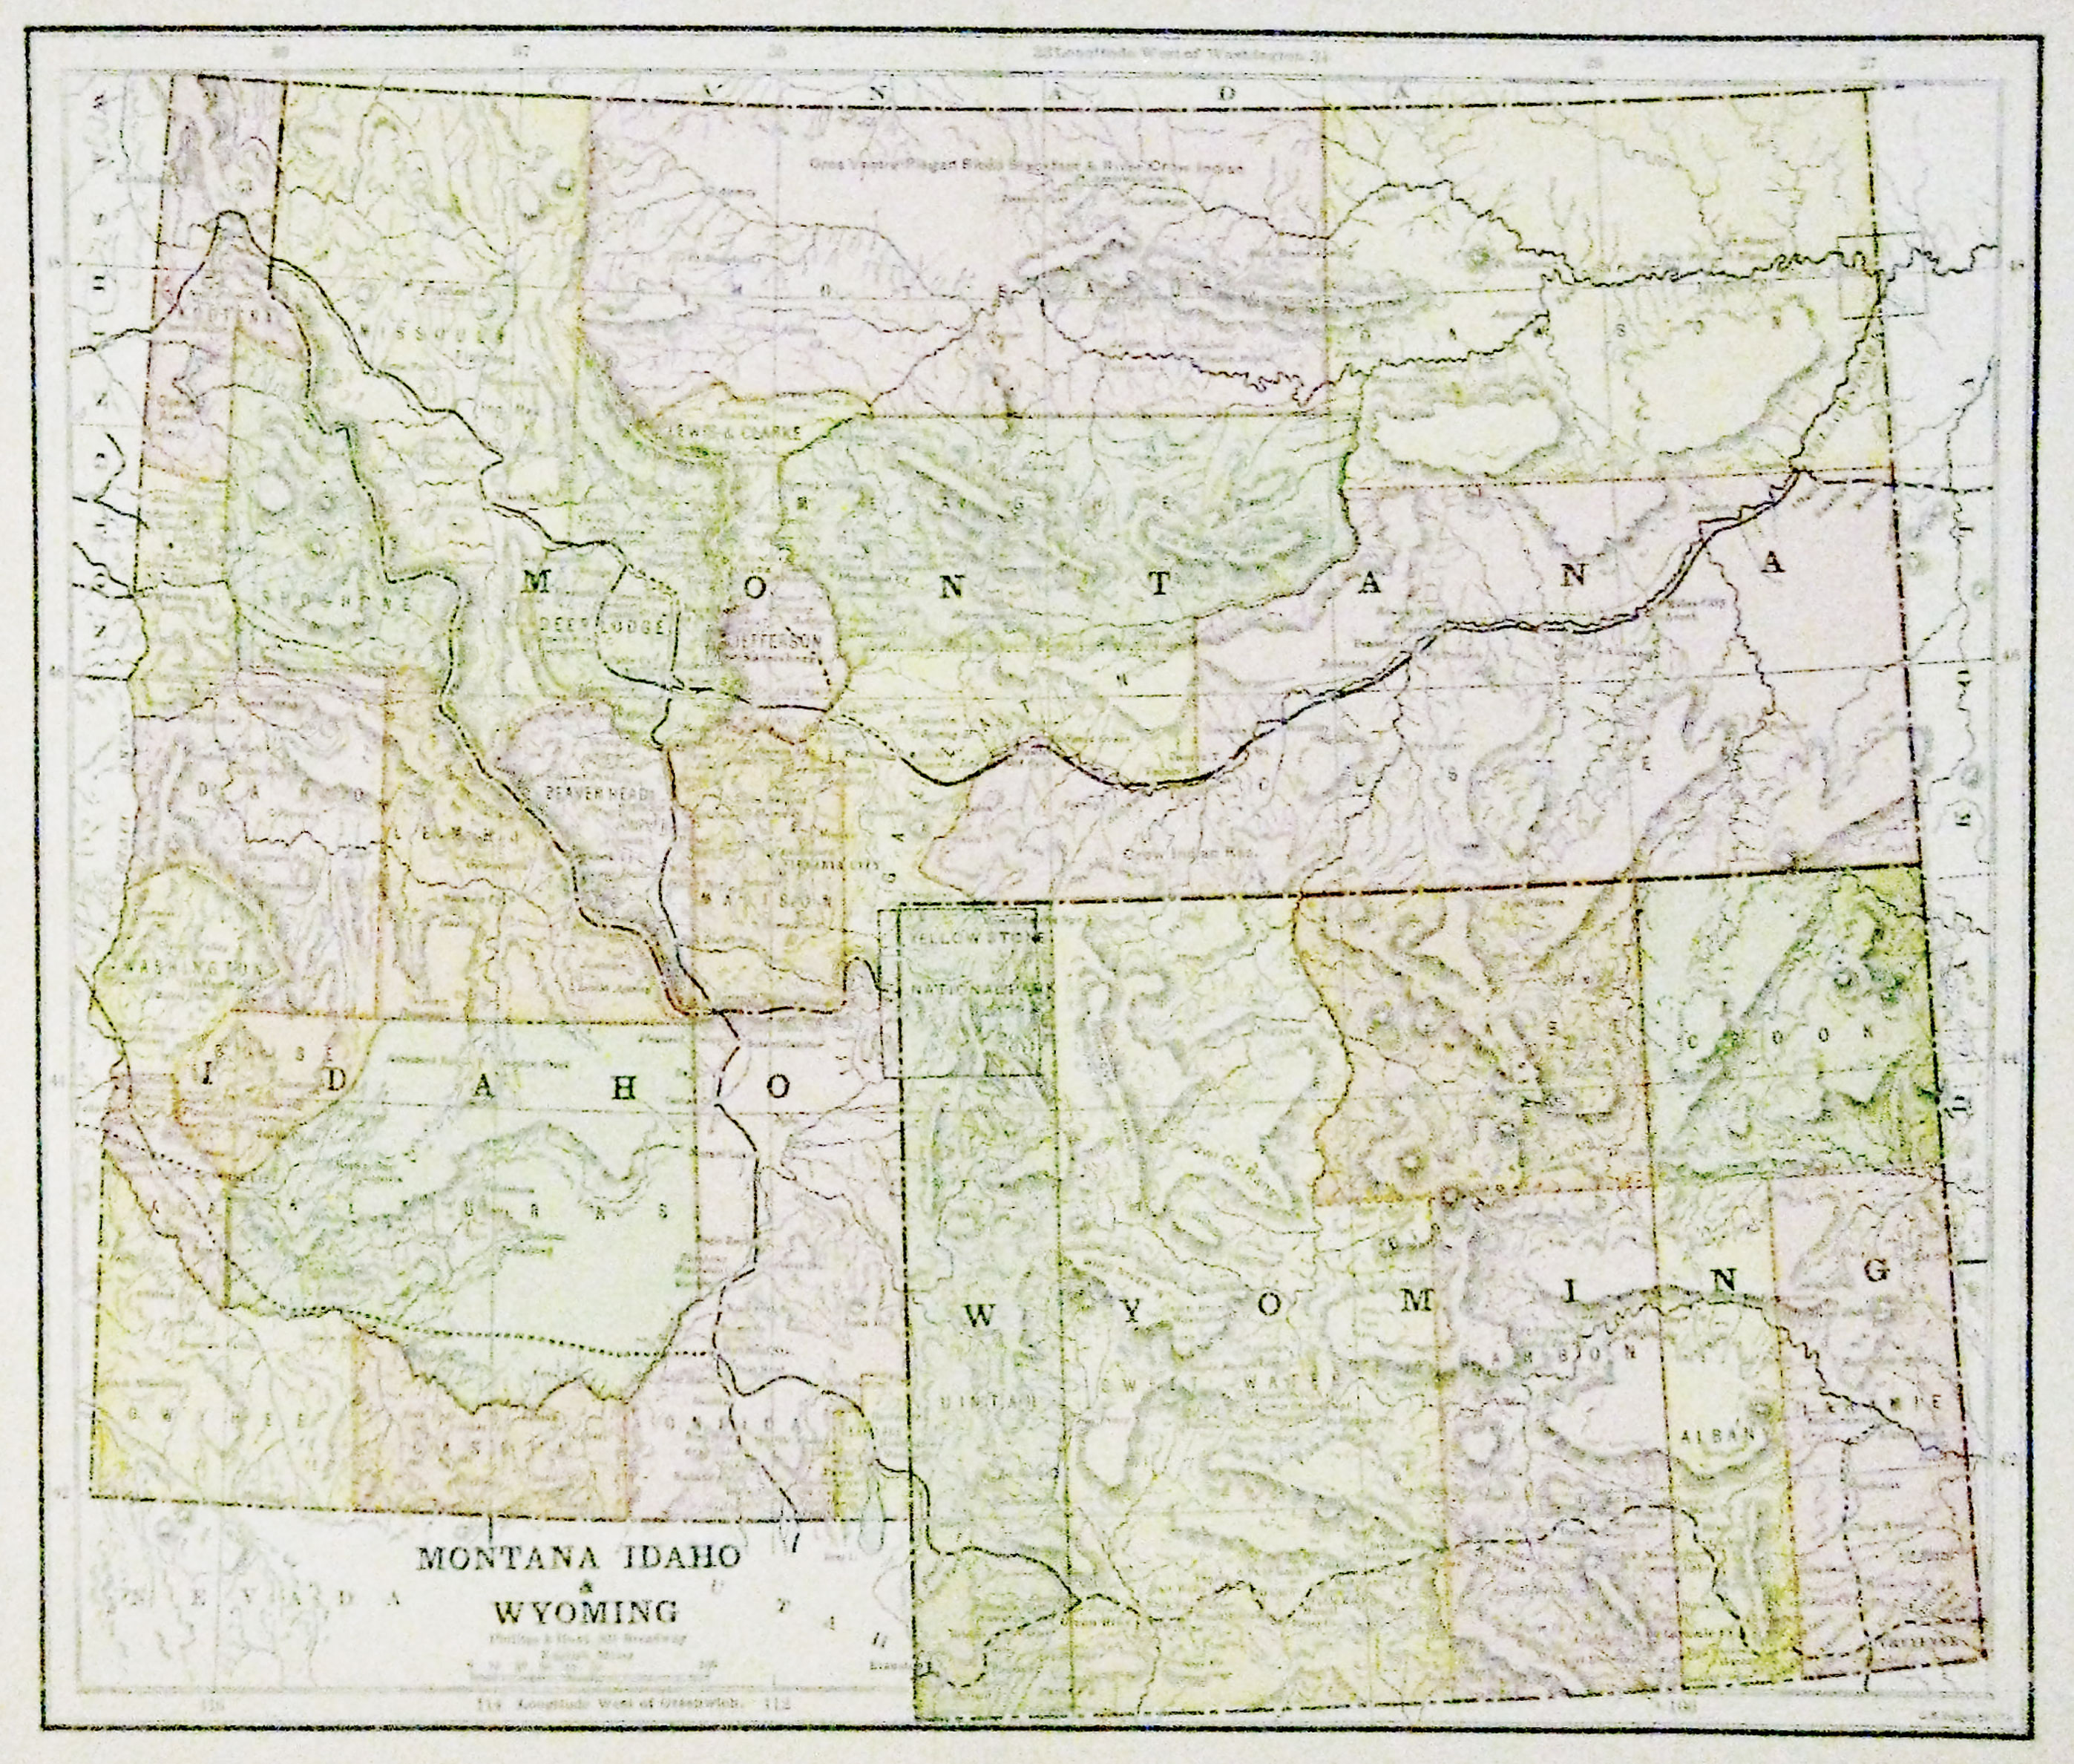 map of wyoming and idaho Map Of Montana Idaho Wyoming 1885 11 X 13 Multi Colored map of wyoming and idaho